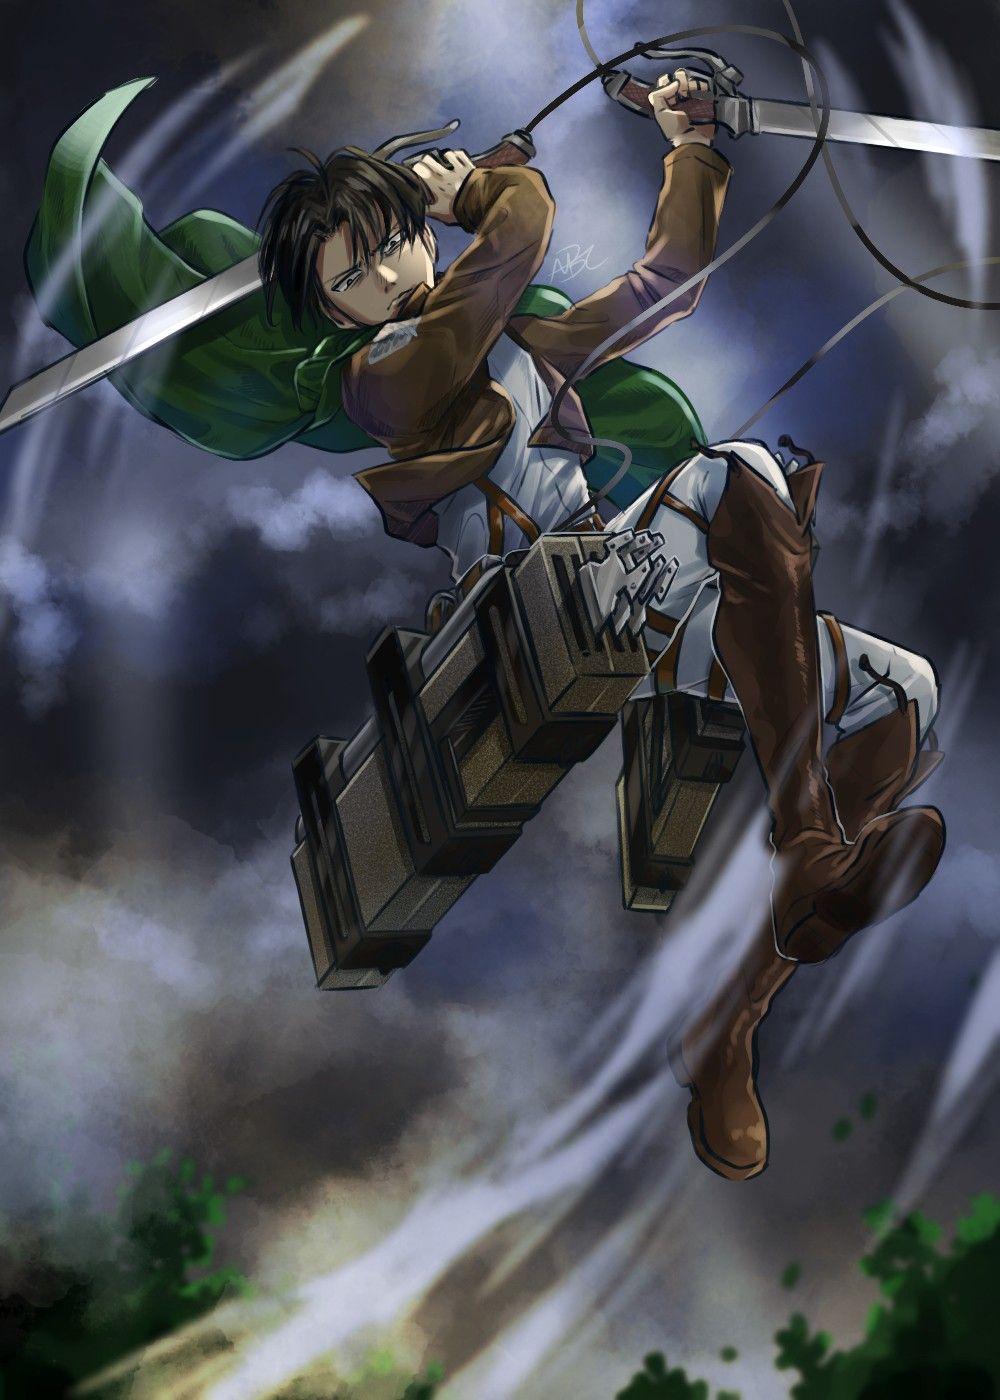 Levi Ackerman Attack On Titan Anime Attack On Titan Levi Attack On Titan Art